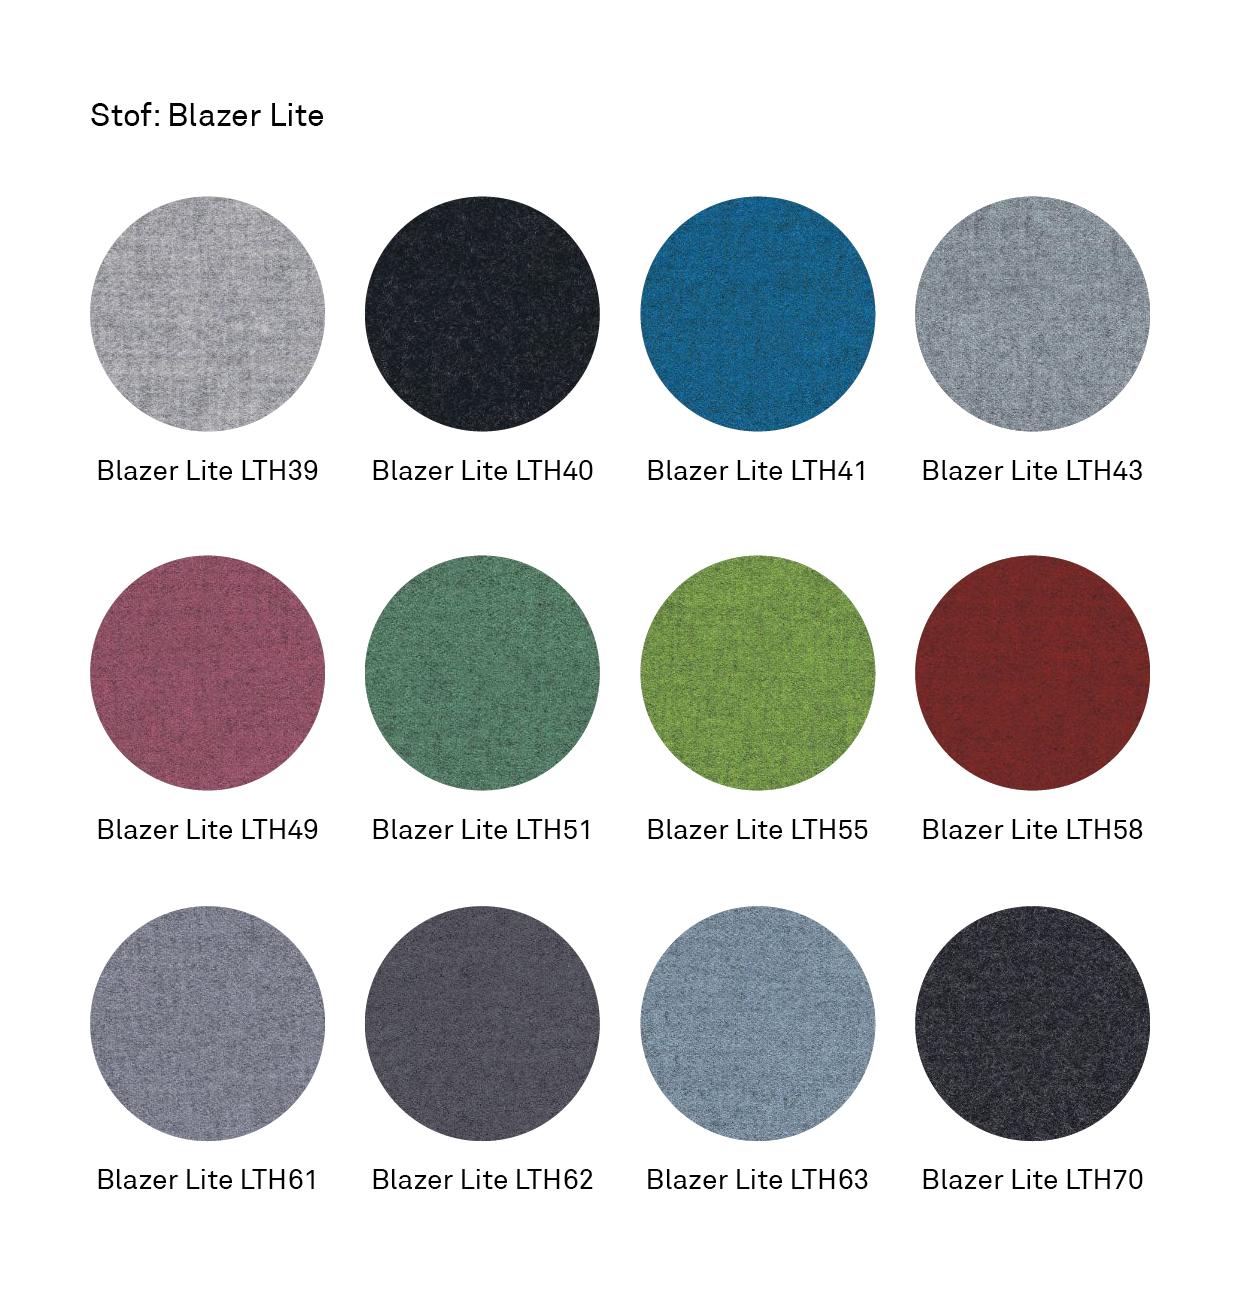 Farveskema_Textile-opslagstavle_BlazerLite